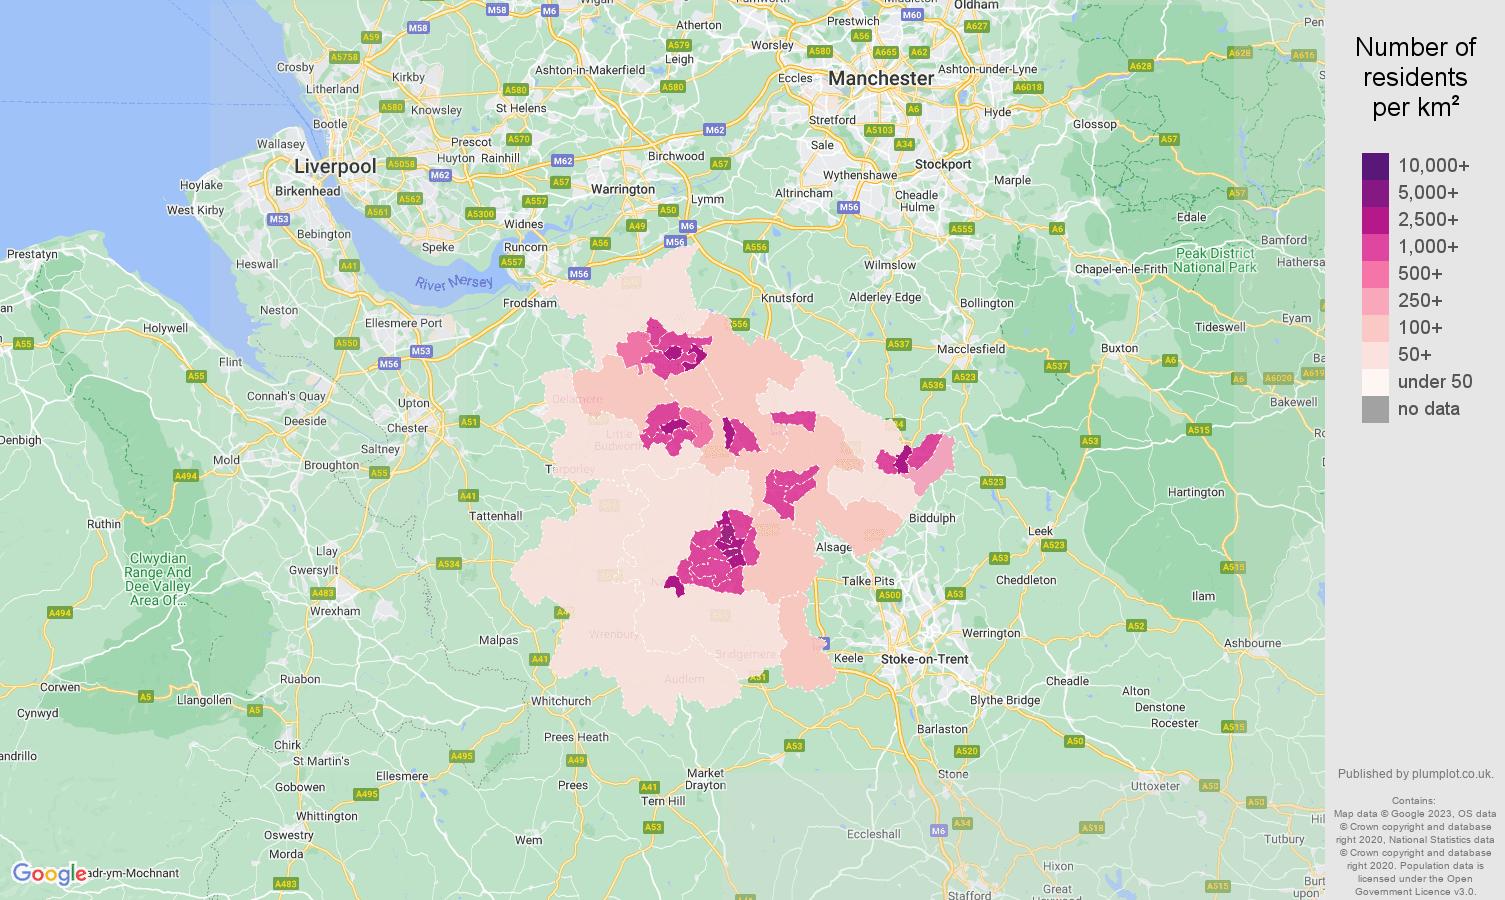 Crewe population density map